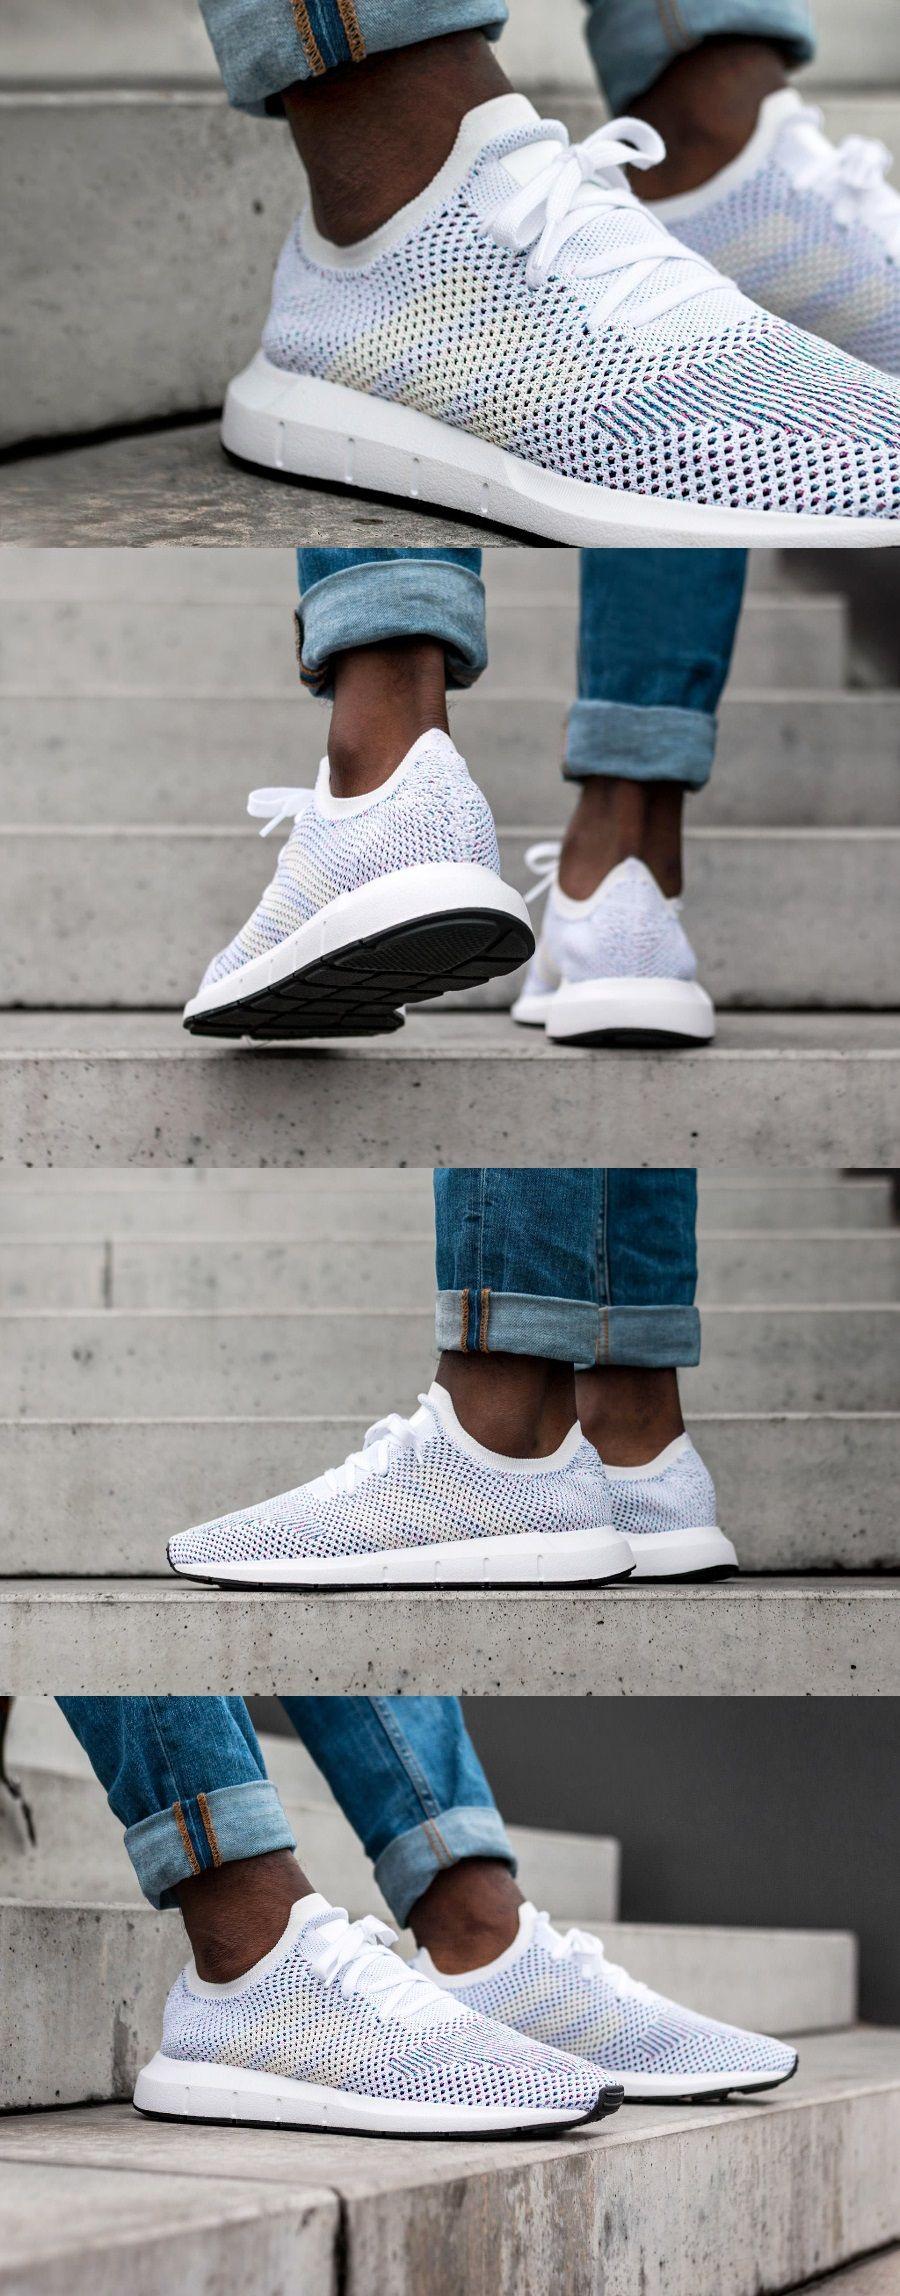 #Adidas #Swift #Run https://tmblr.co/ZnVlHd2OD7a3C